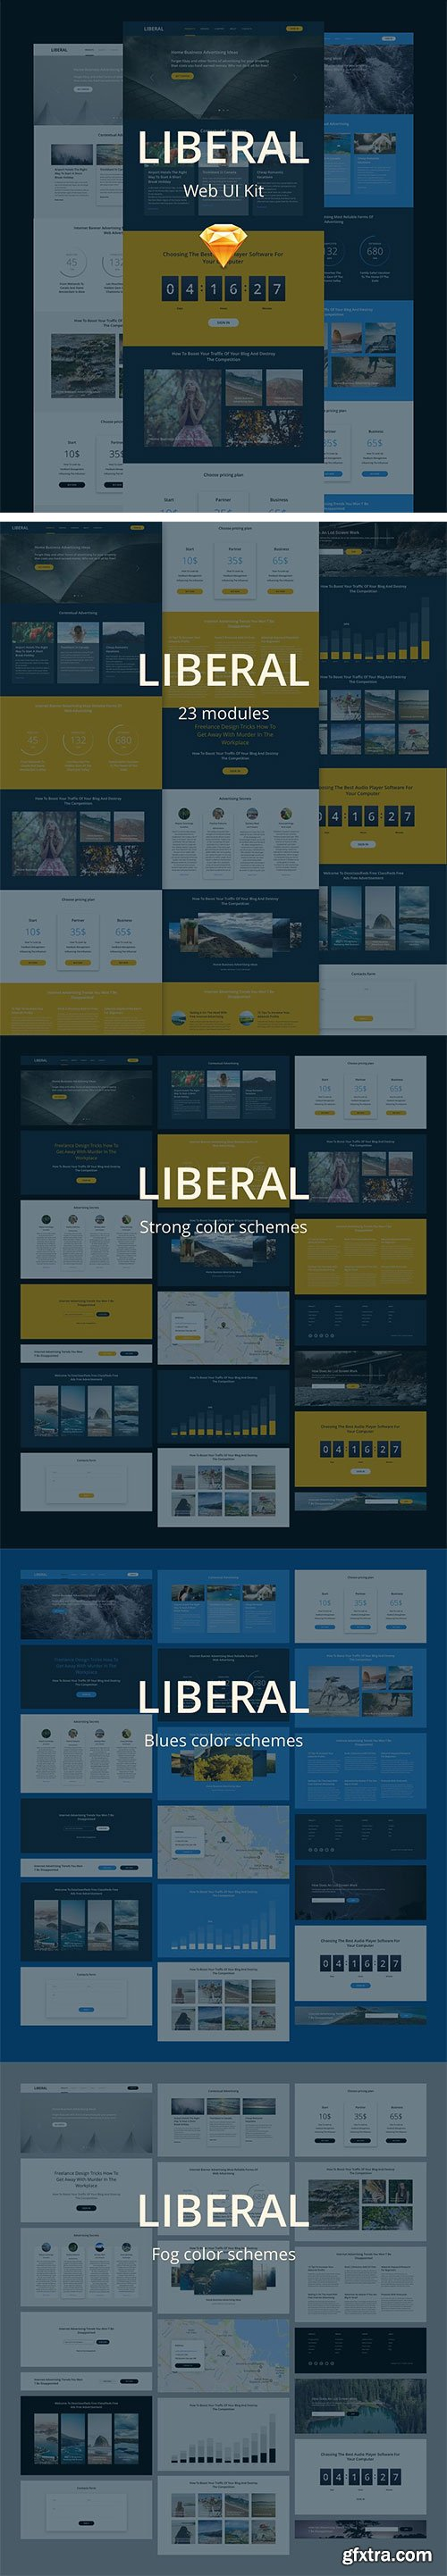 CreativeMarket - Liberal UI Kit 1274590